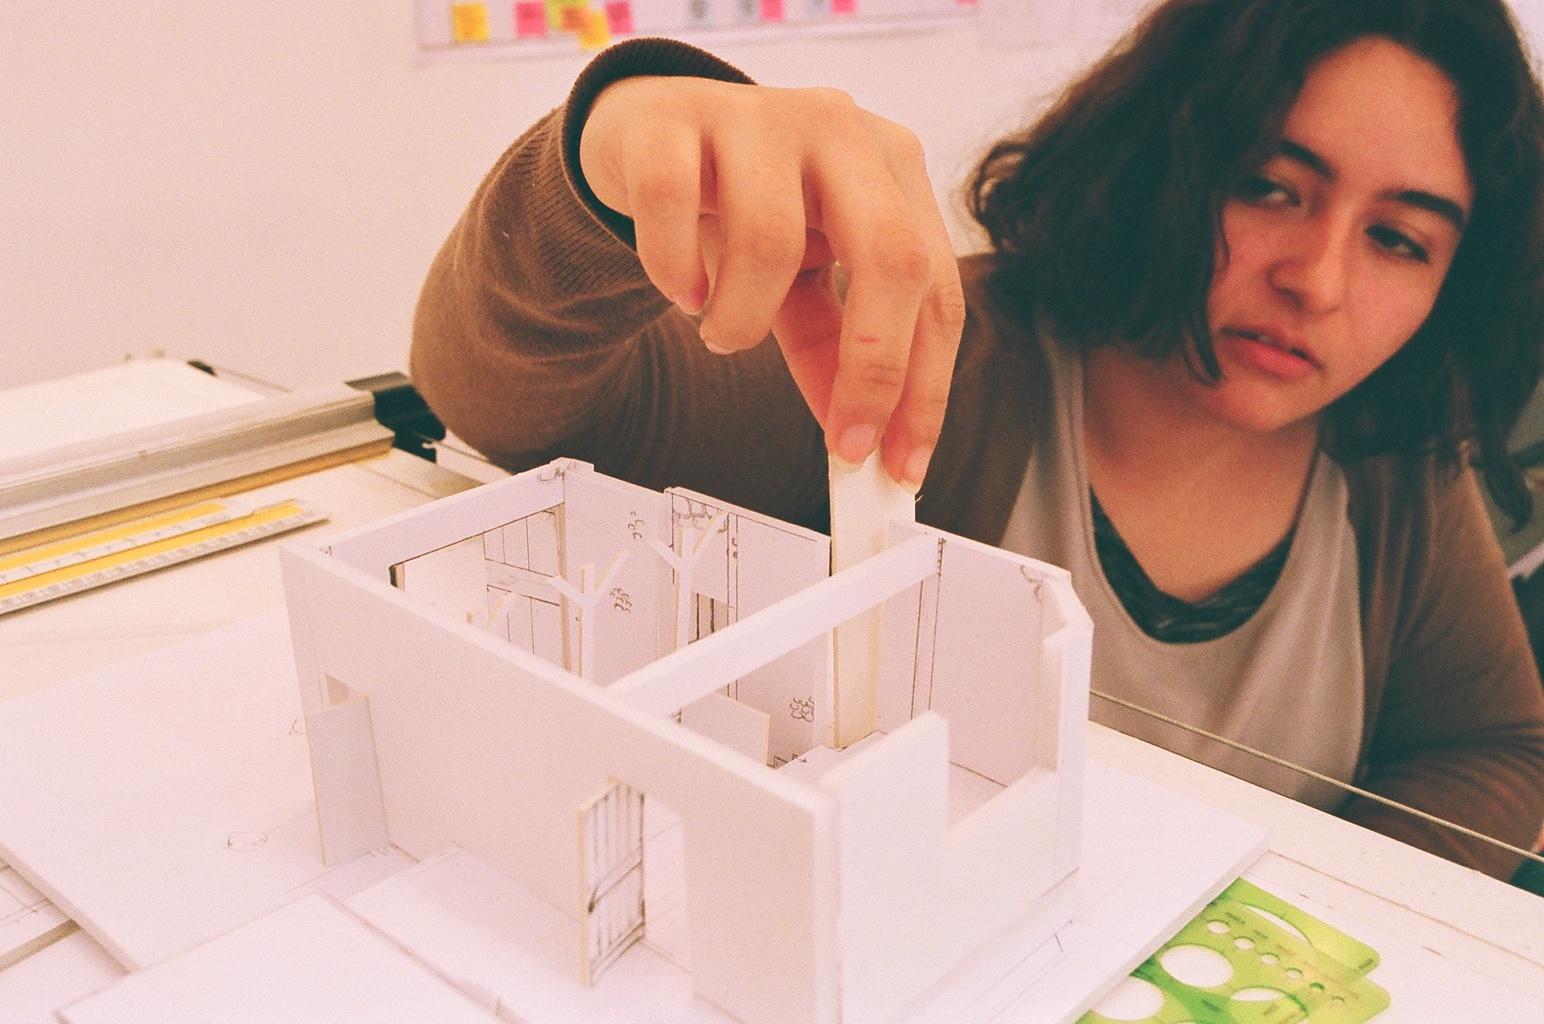 Sofía Arestegui Rodríguez (Mexico) building models